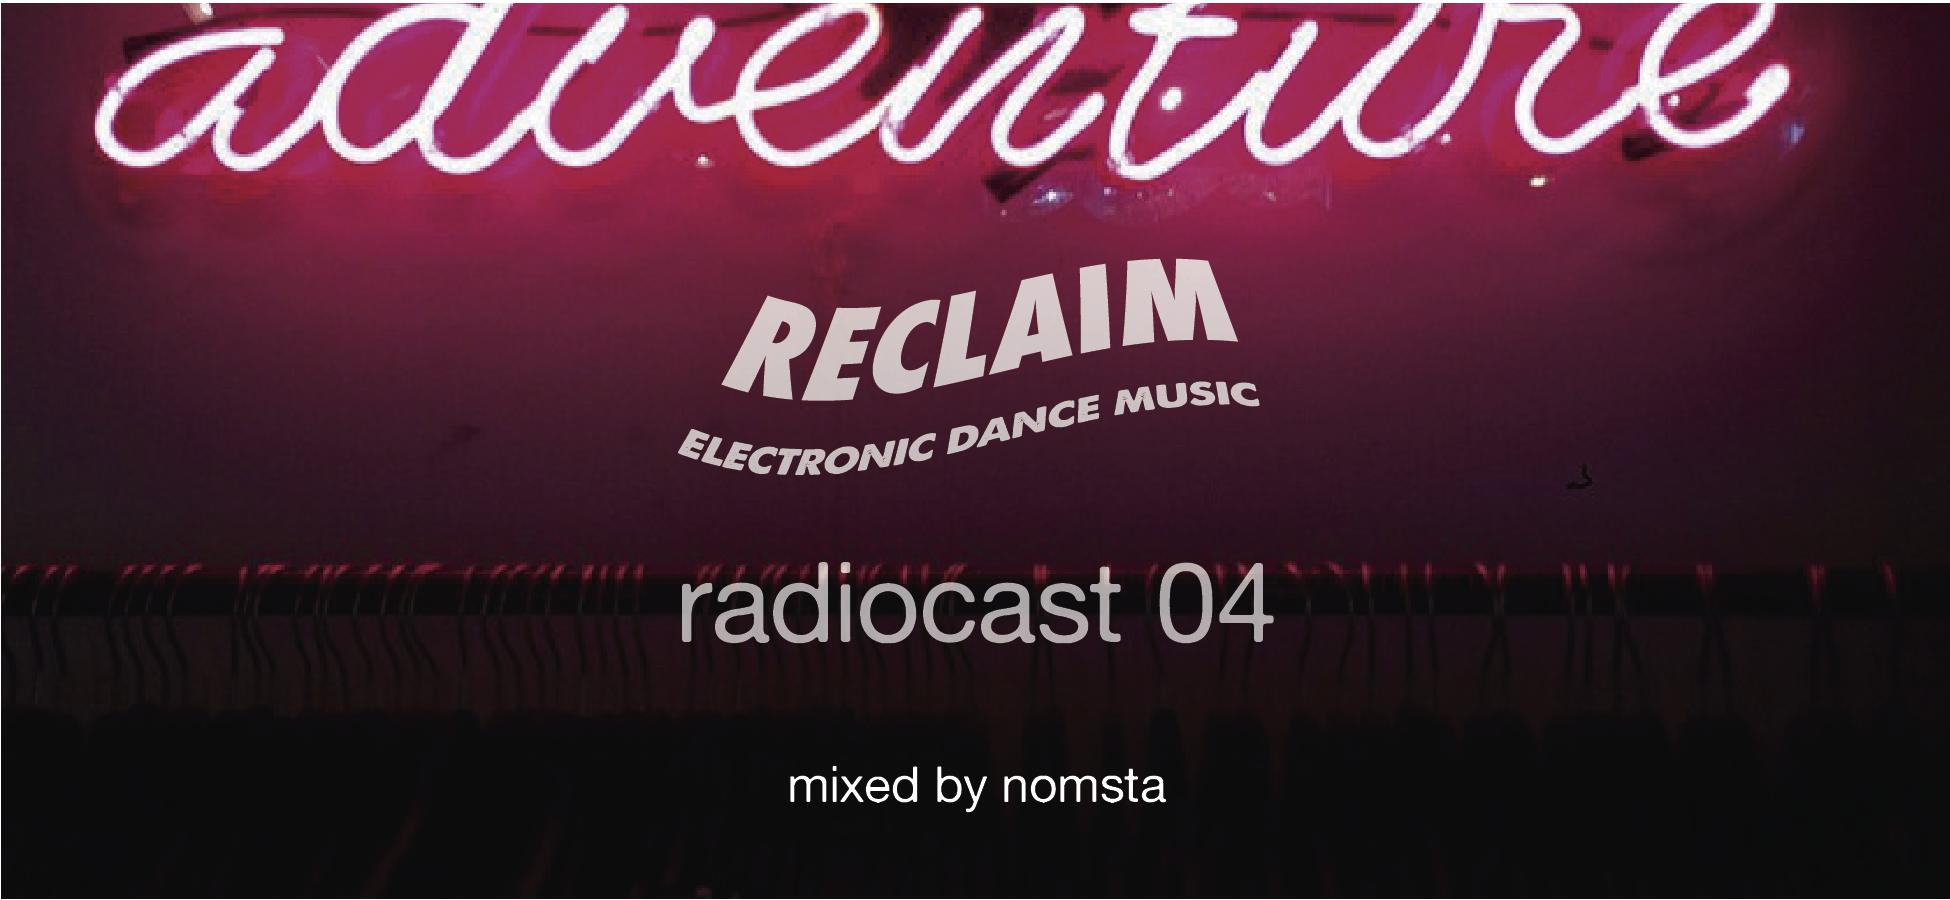 Profile jacques greene reclaimedm radiocast 04 izmirmasajfo